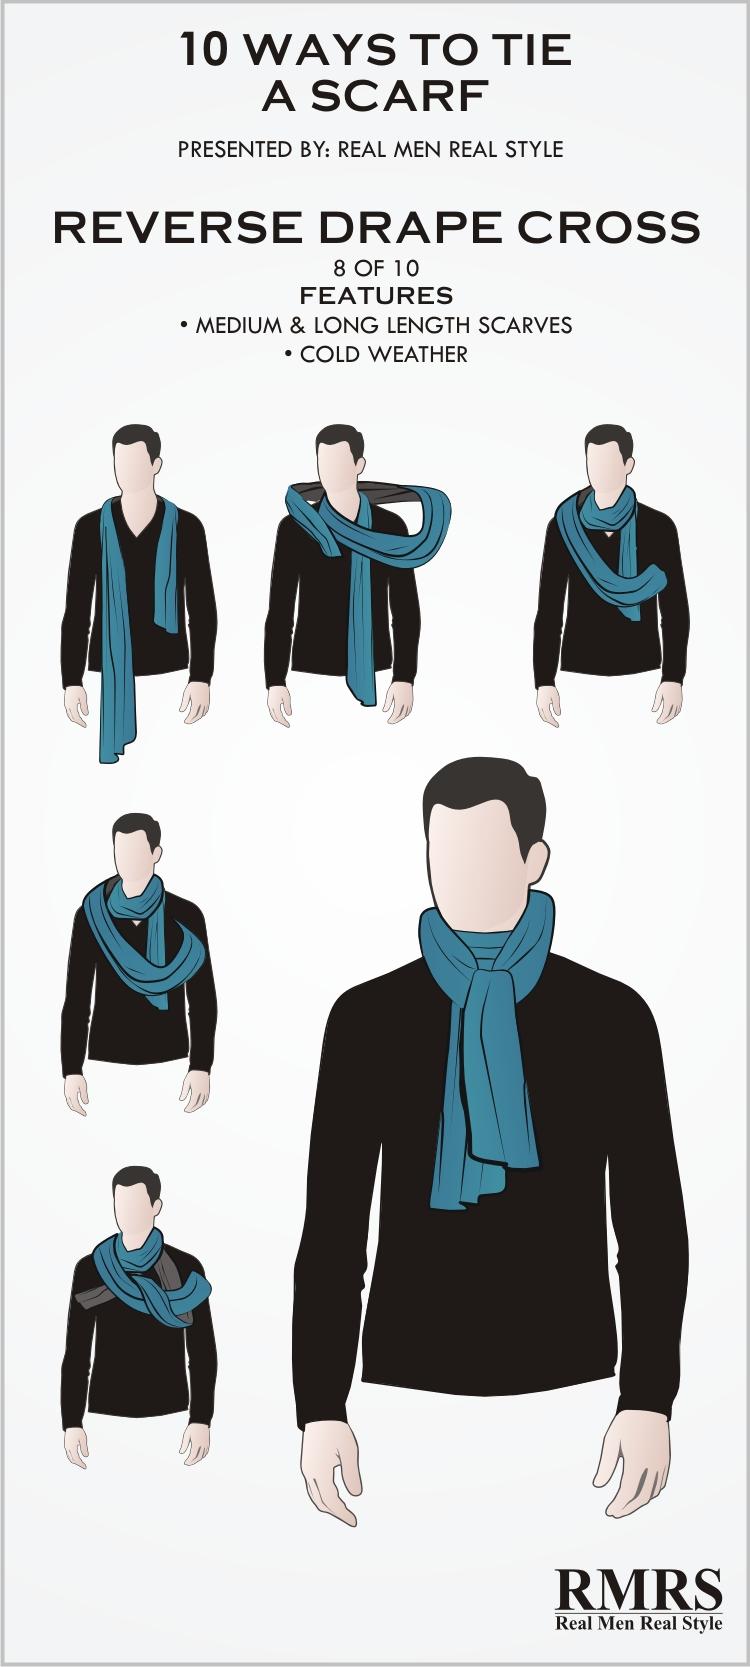 10-ways-to-tie-a-scarf-finall-full-8.jpg